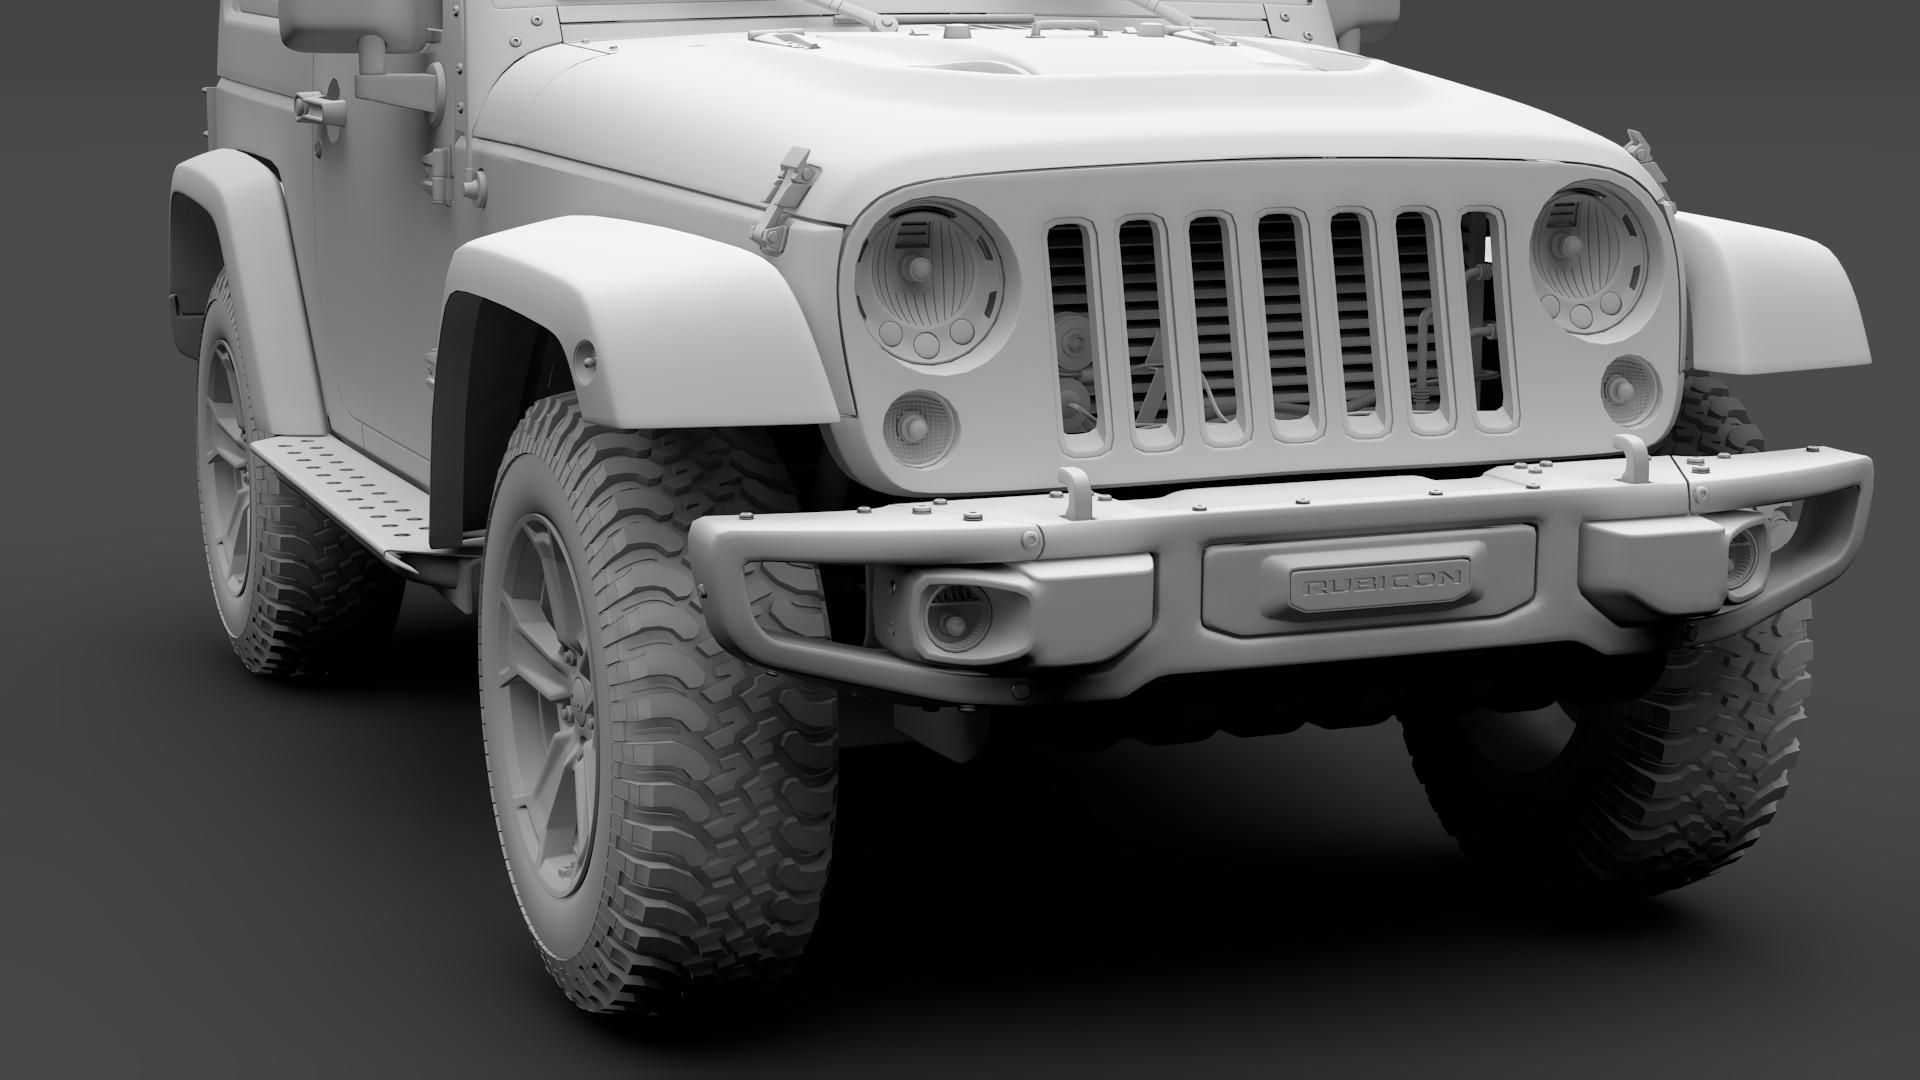 jeep wrangler rubicon recon jk 2017 3d model max fbx lwo ma mb hrc xsi obj 276957